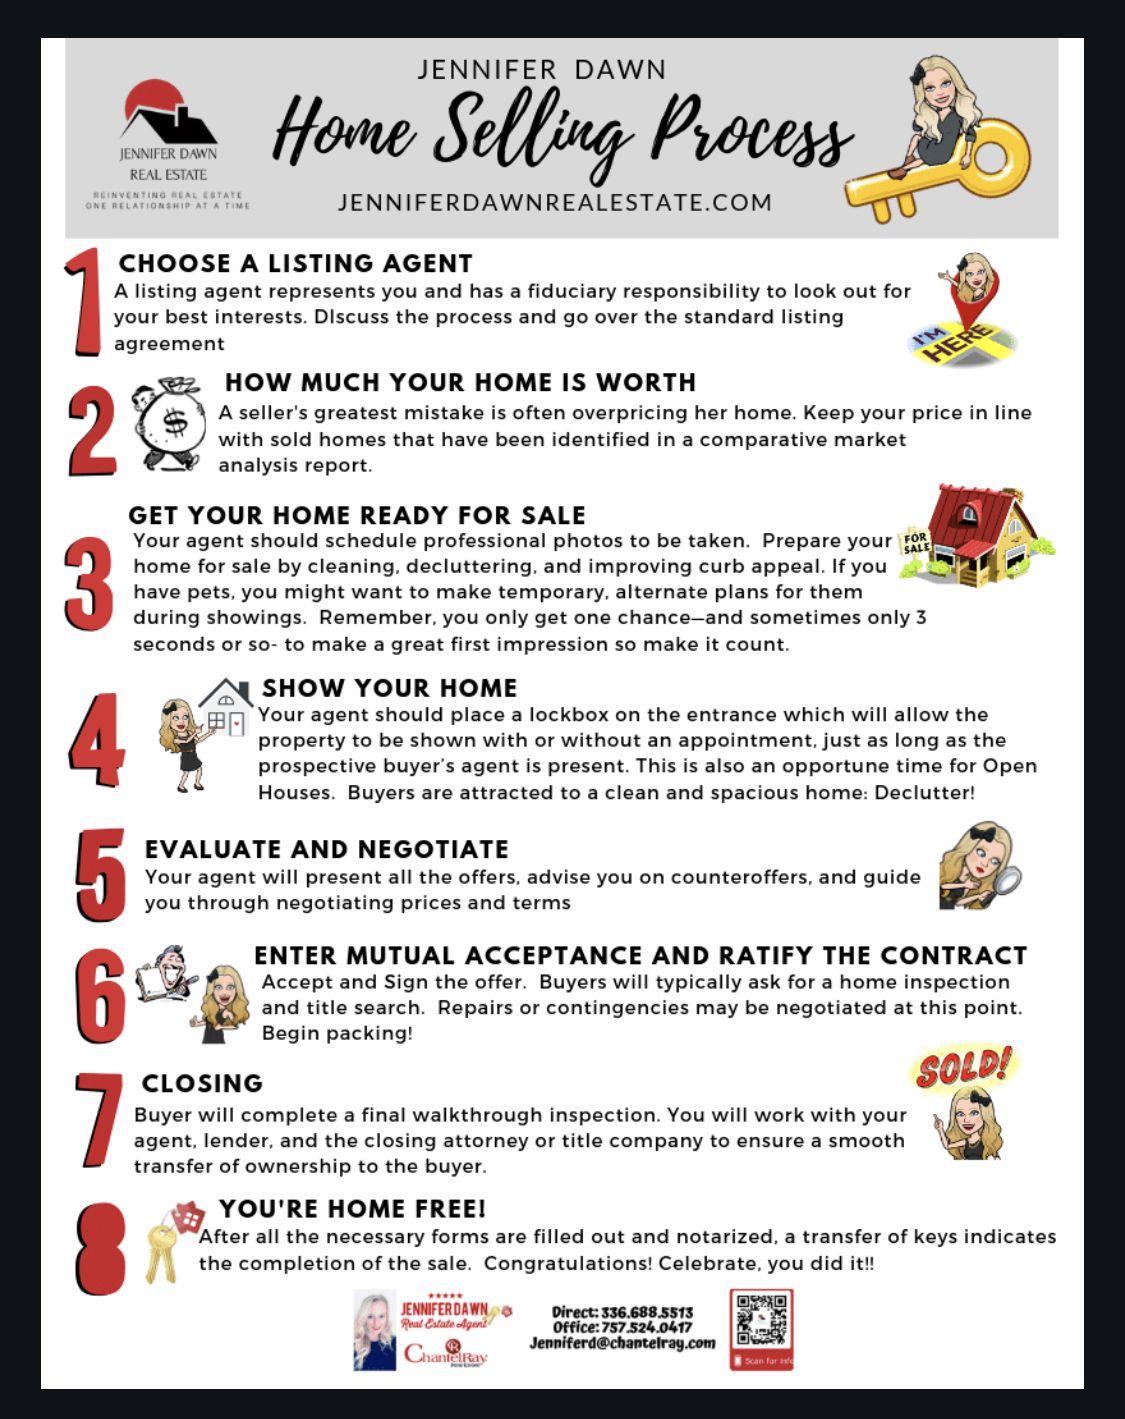 Home Listing Process With Jennifer Dawn